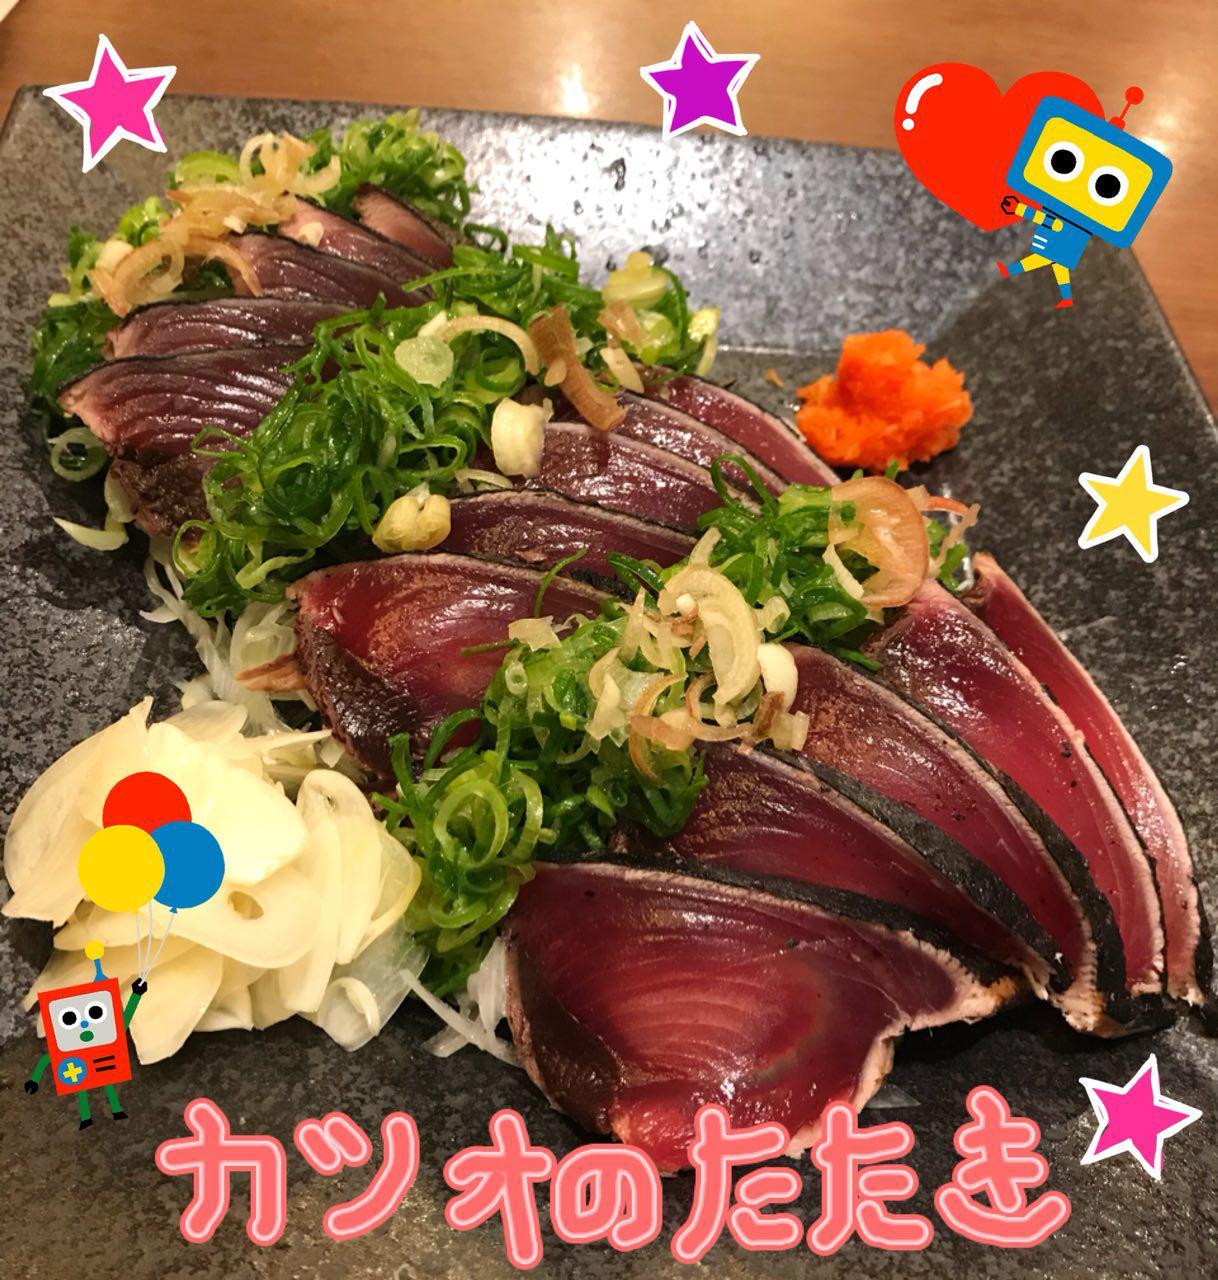 photo_2018-04-07_23-27-58.jpg